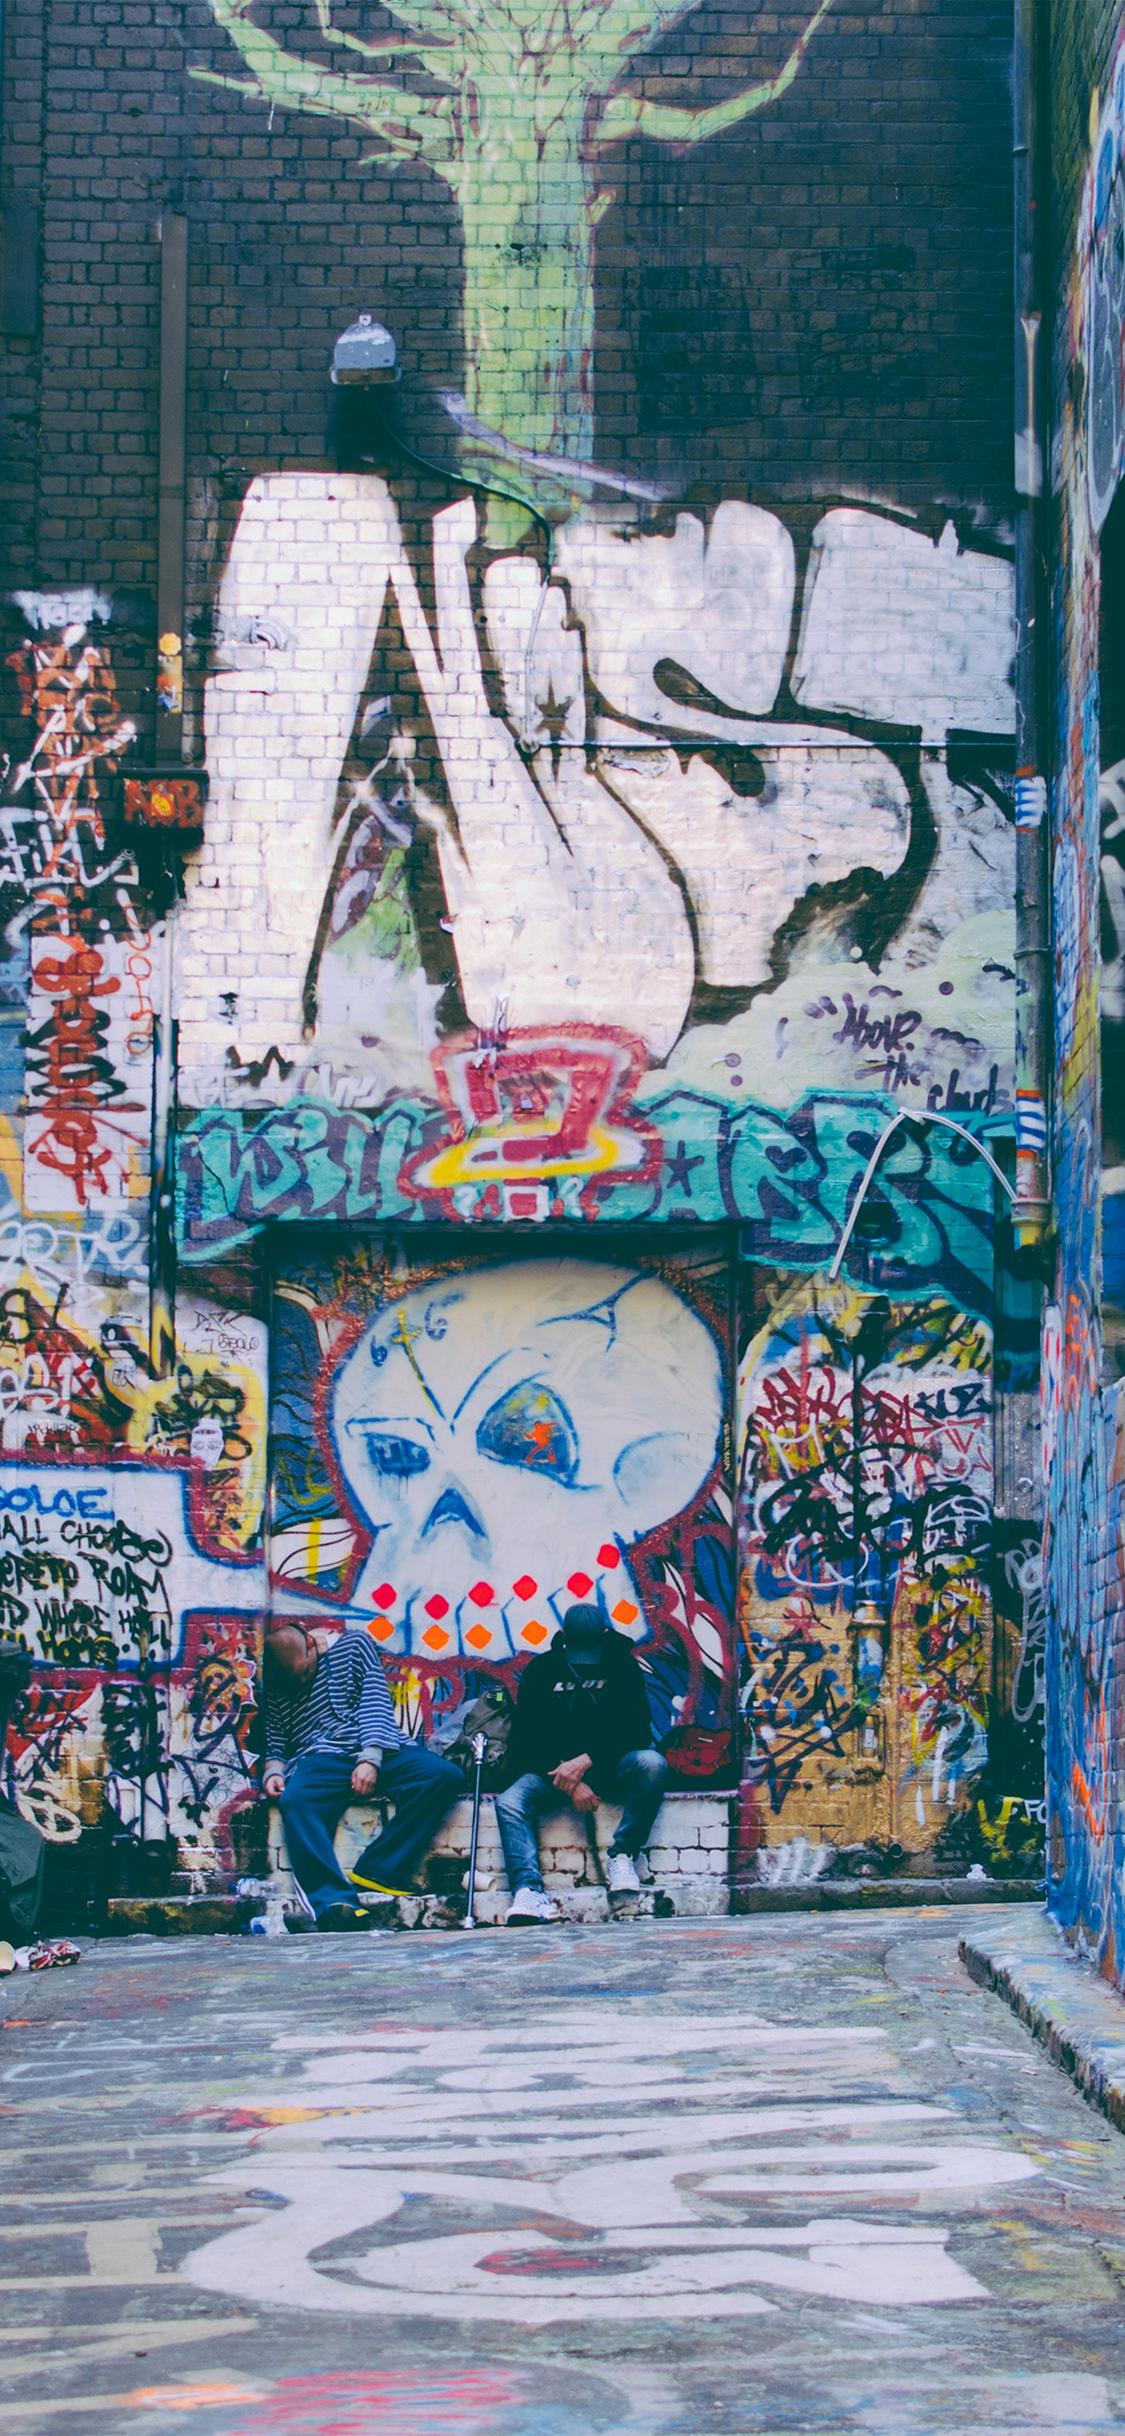 Iphone X - Iphone X Wallpaper Graffiti , HD Wallpaper & Backgrounds